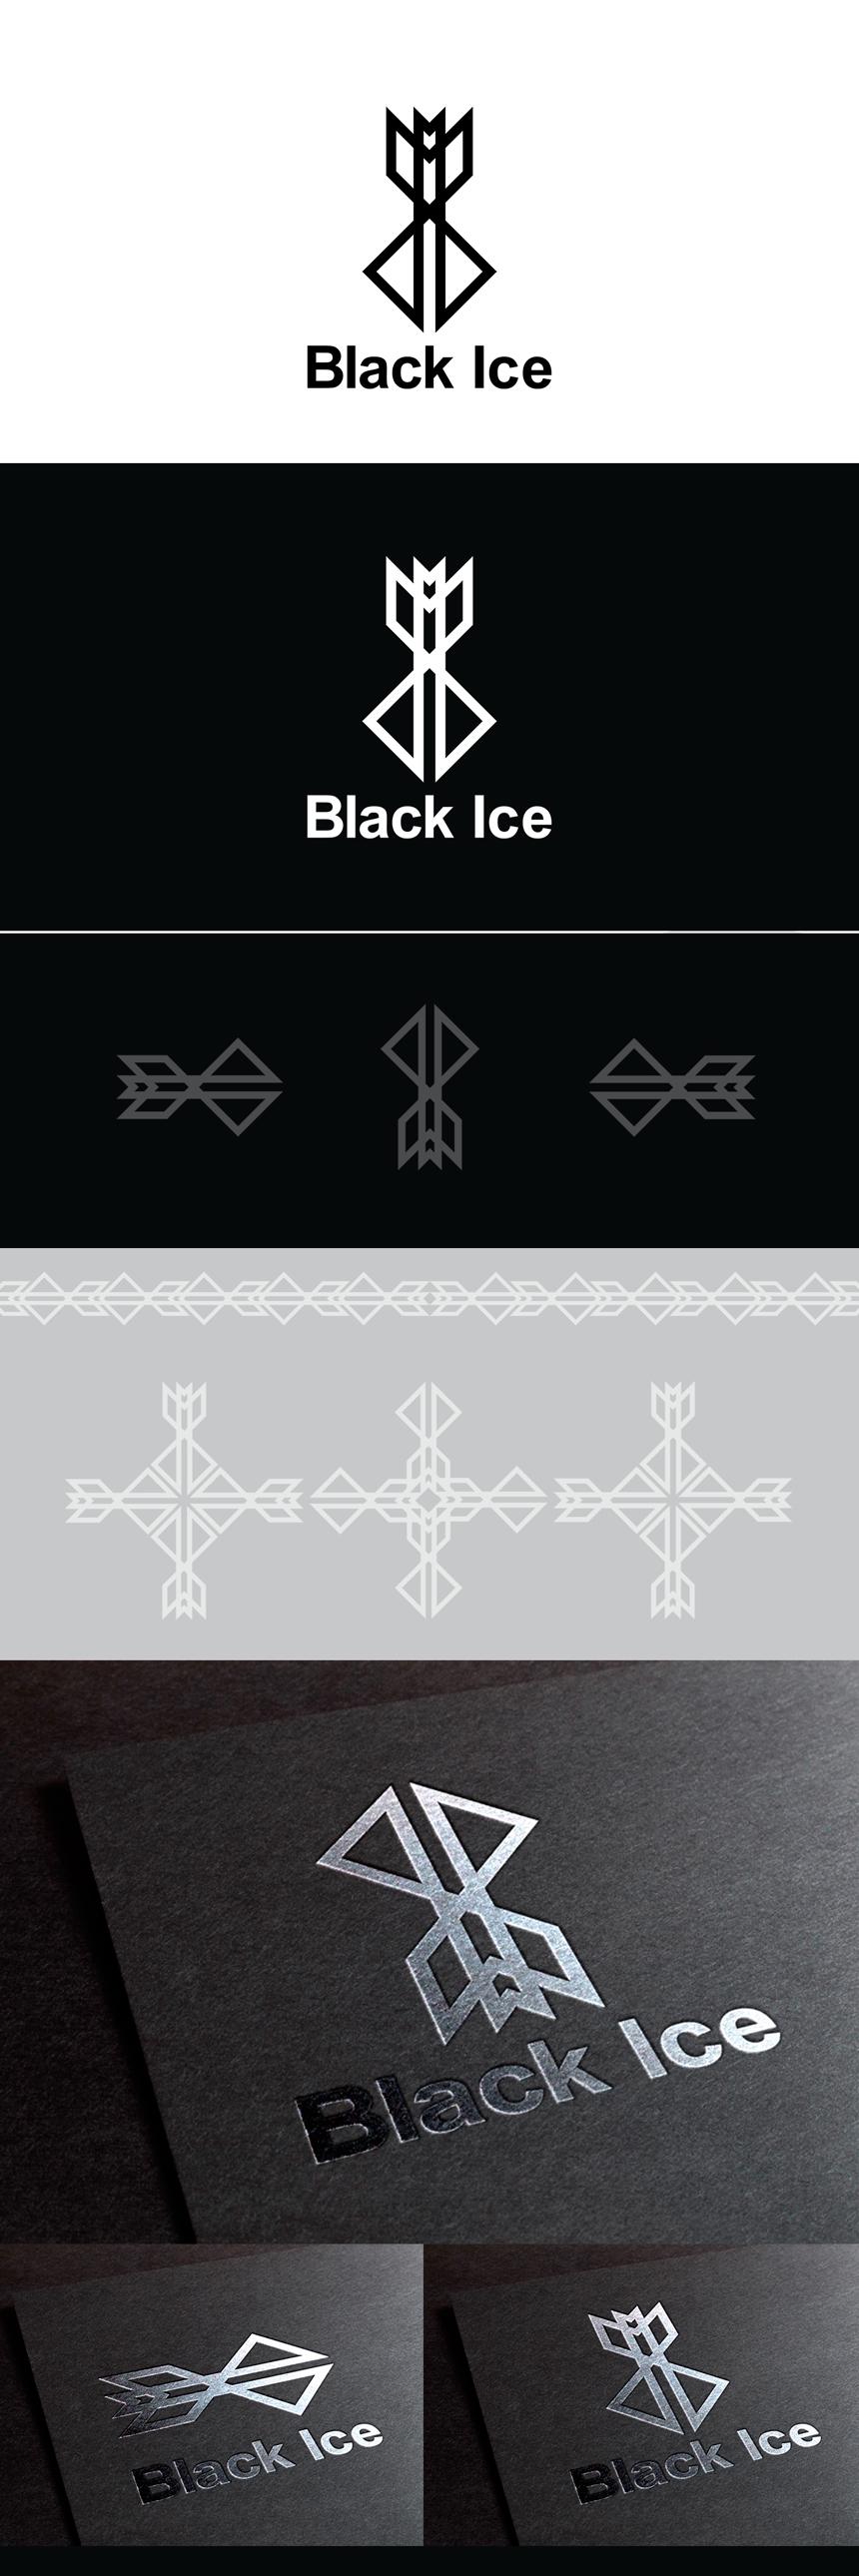 "Логотип + Фирменный стиль для компании ""BLACK ICE"" фото f_09156dec6fe24e54.jpg"